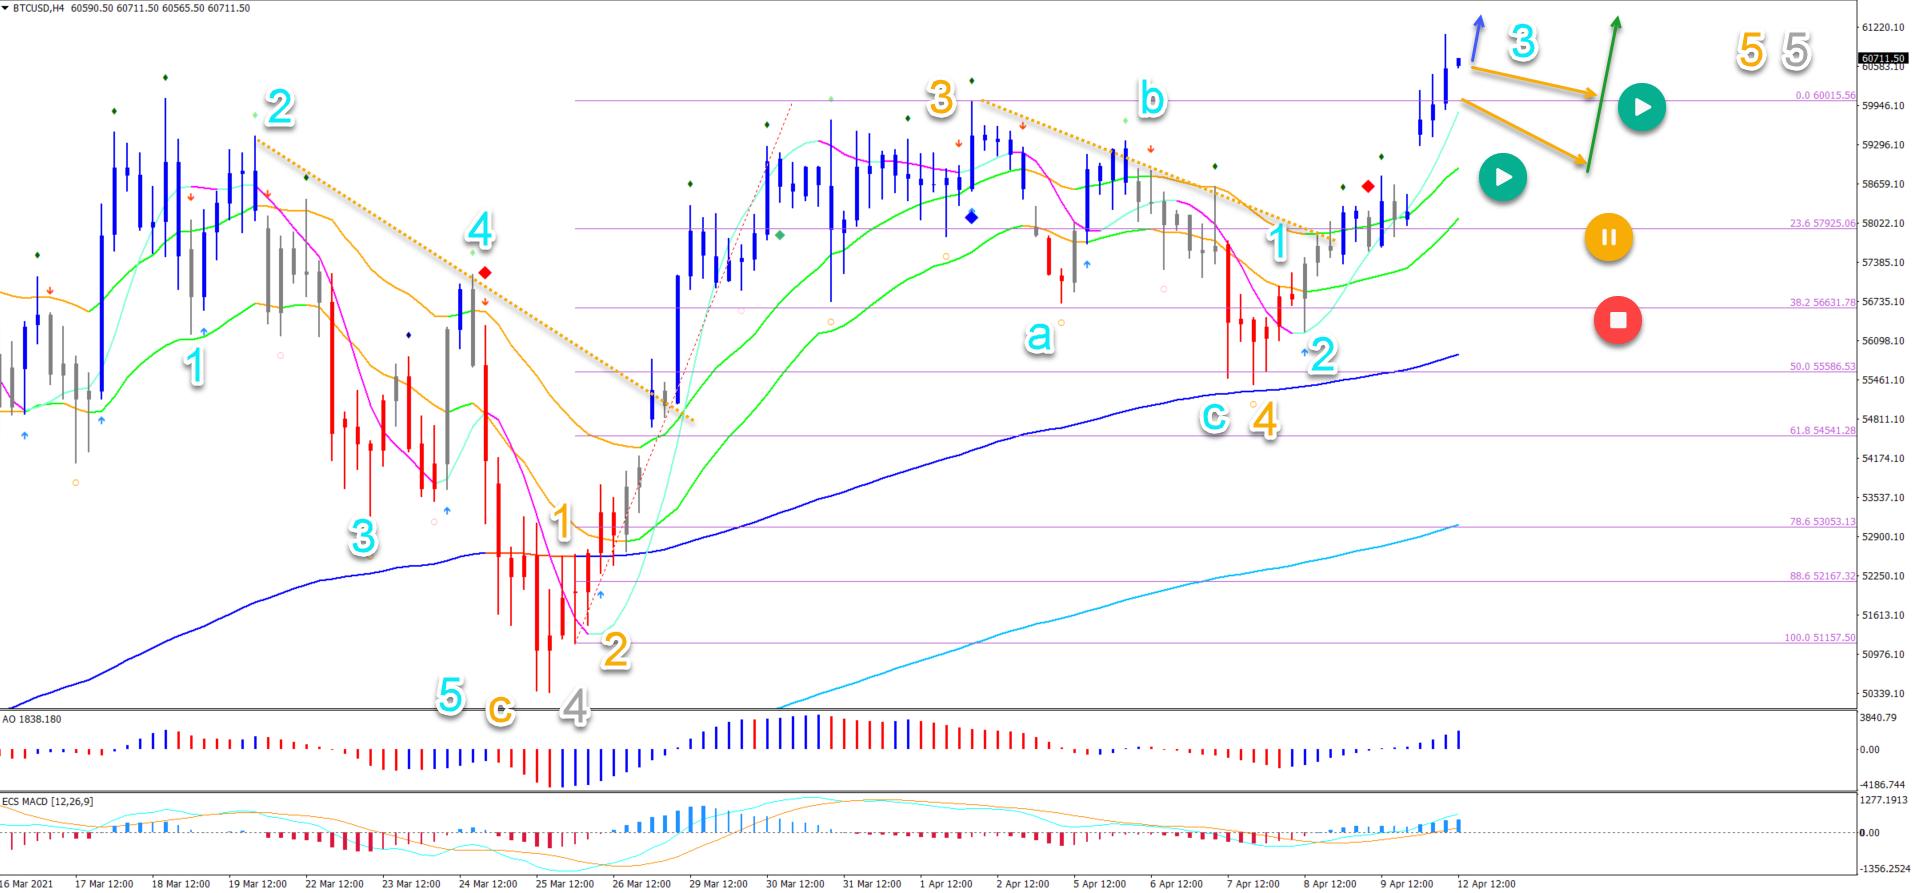 BTC/USD 12.04.2021 4 hour chart